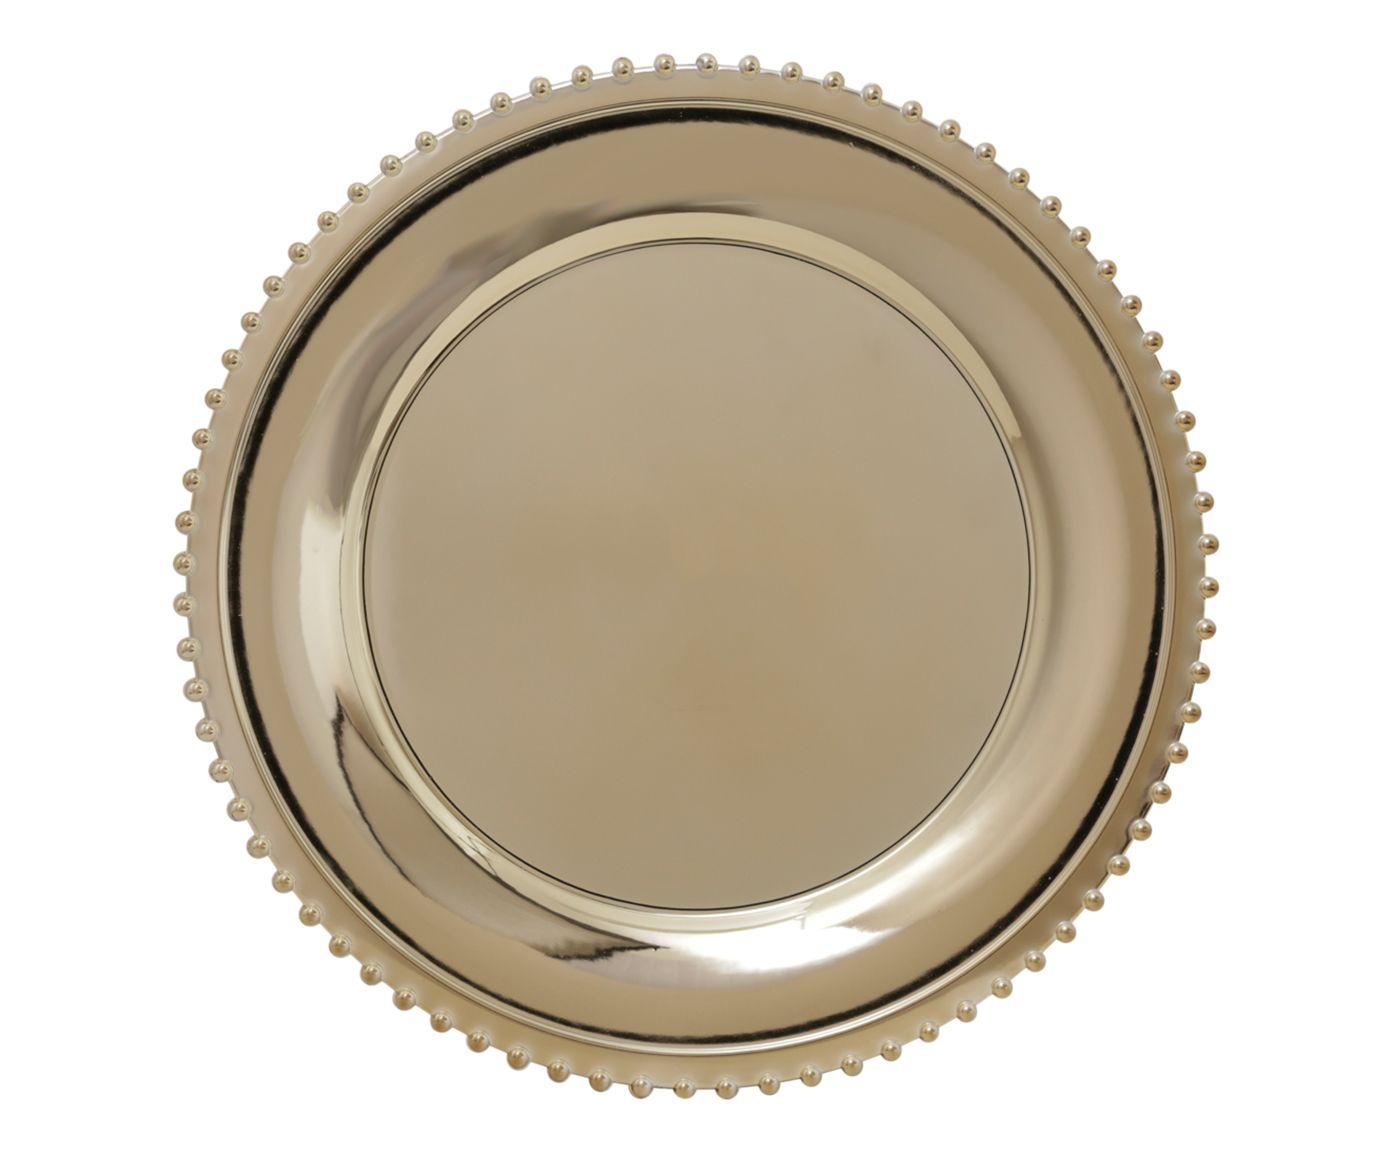 Sousplat Ruan - 33cm | Westwing.com.br